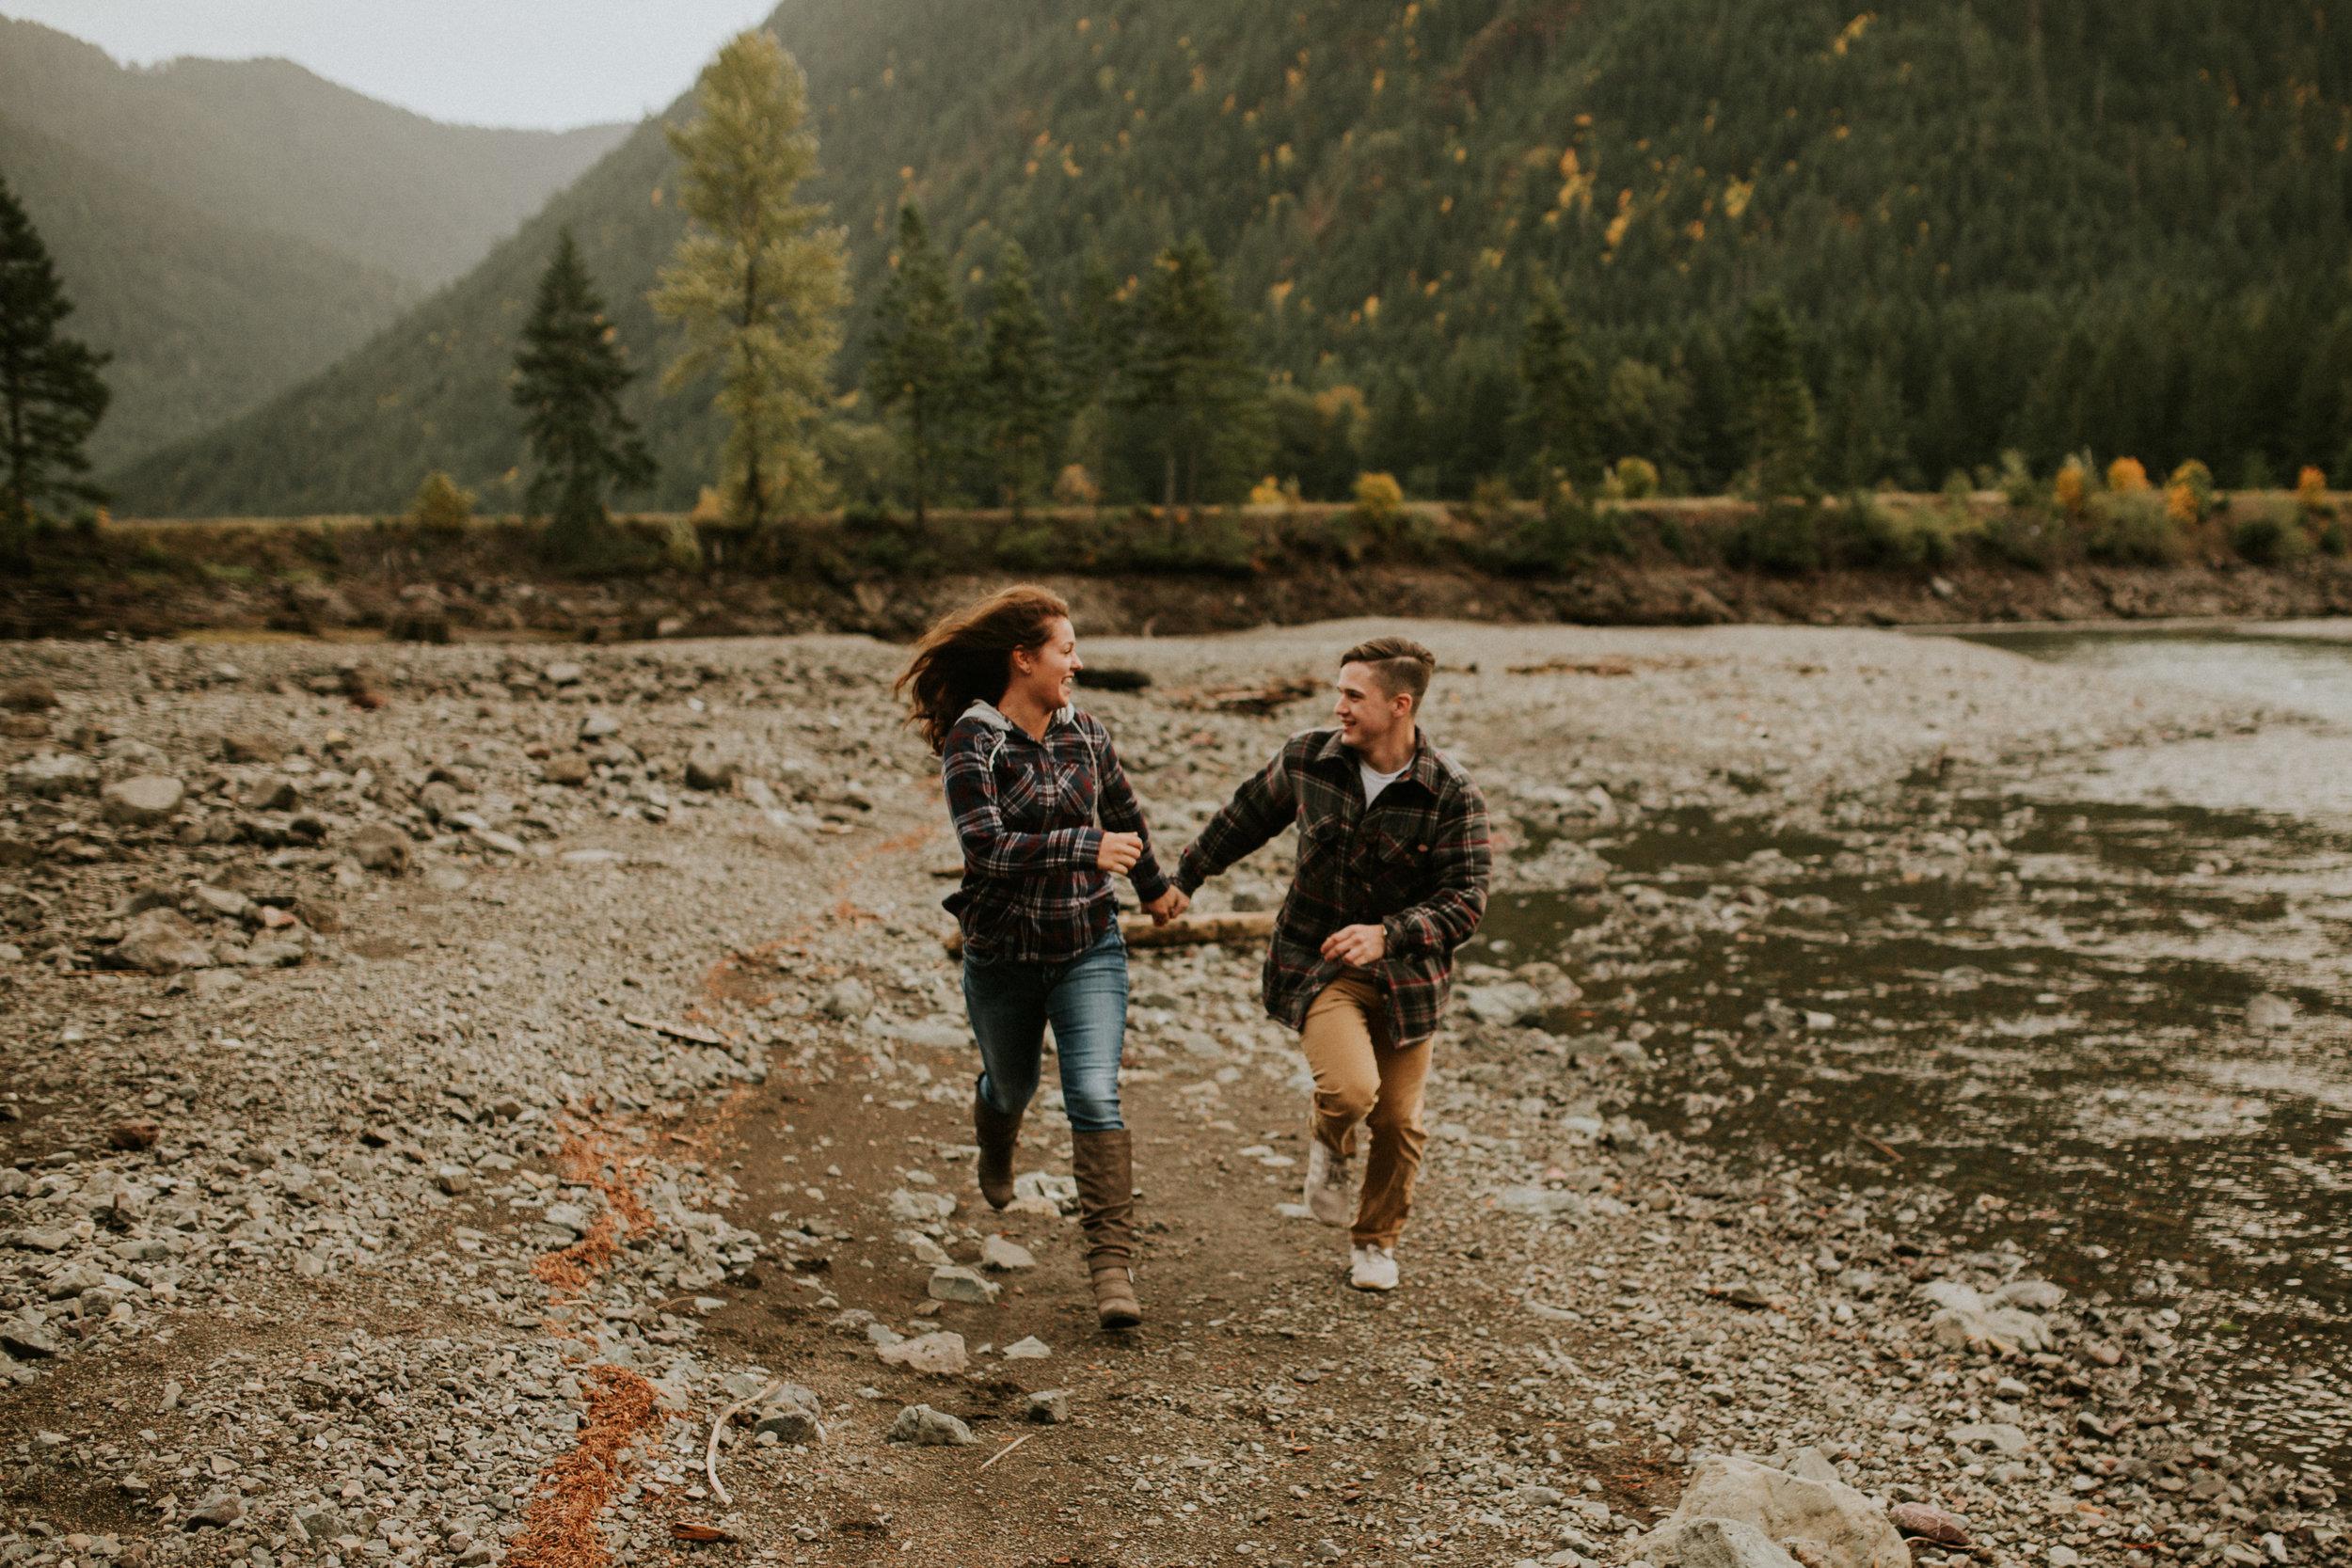 Lake-Cushman-Adventure-Engagement-photographer-breeanna-lasher-14.jpg